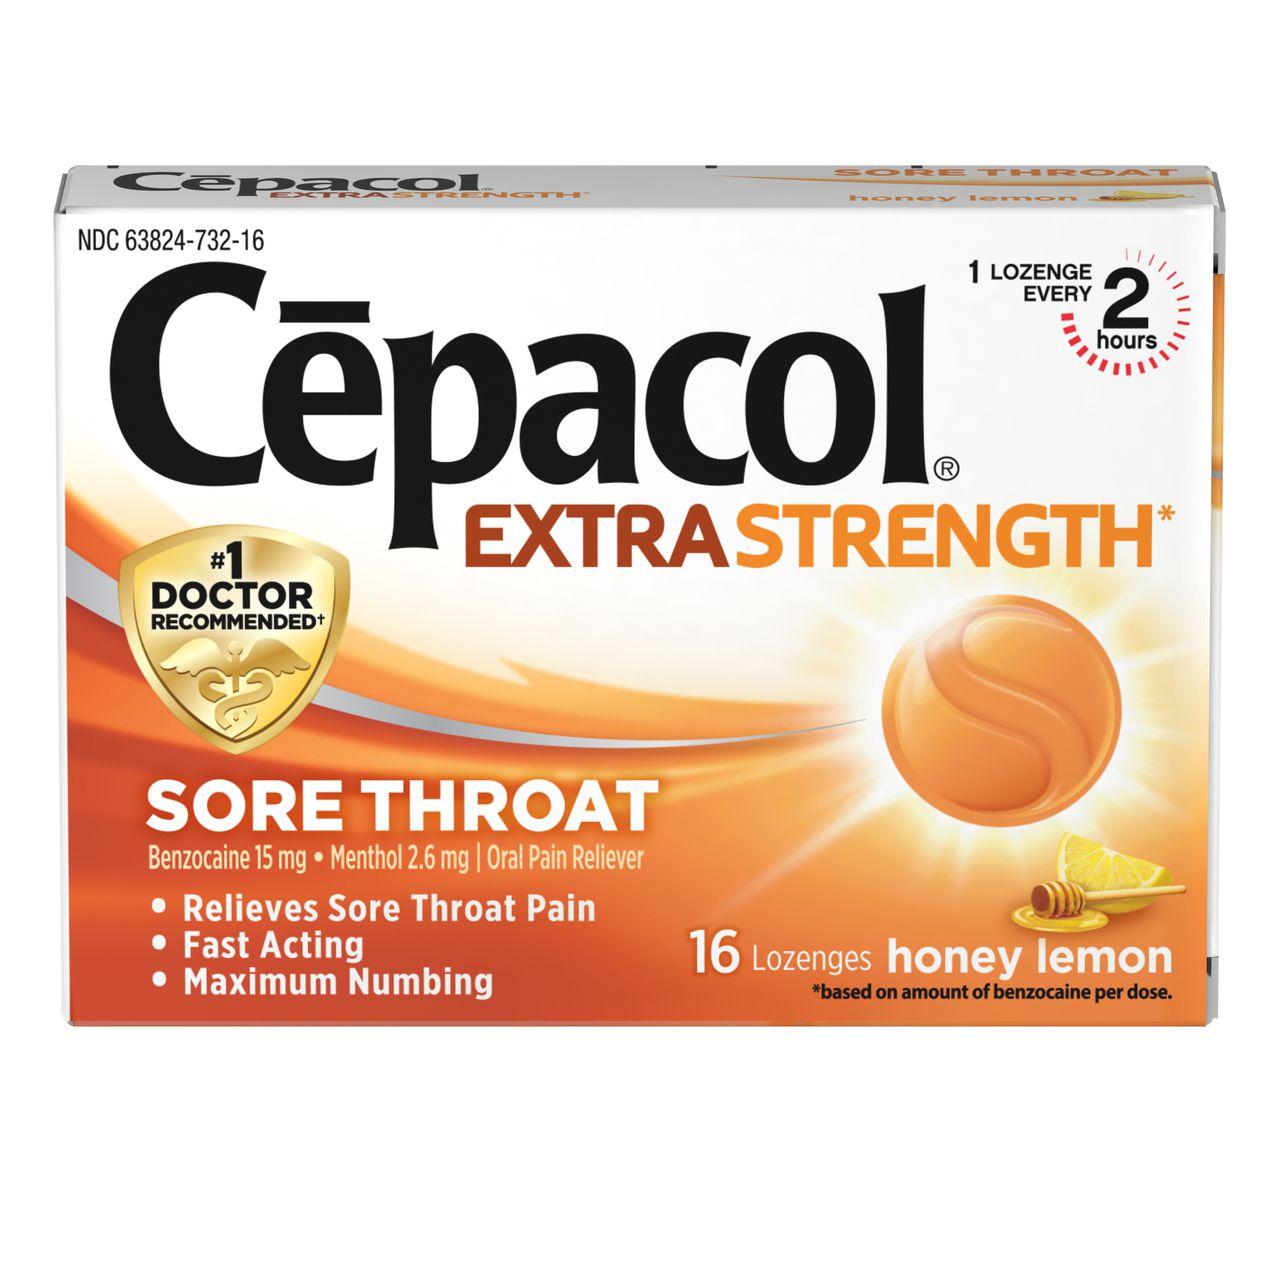 sore throat honey lemon lozenges | cēpacol®